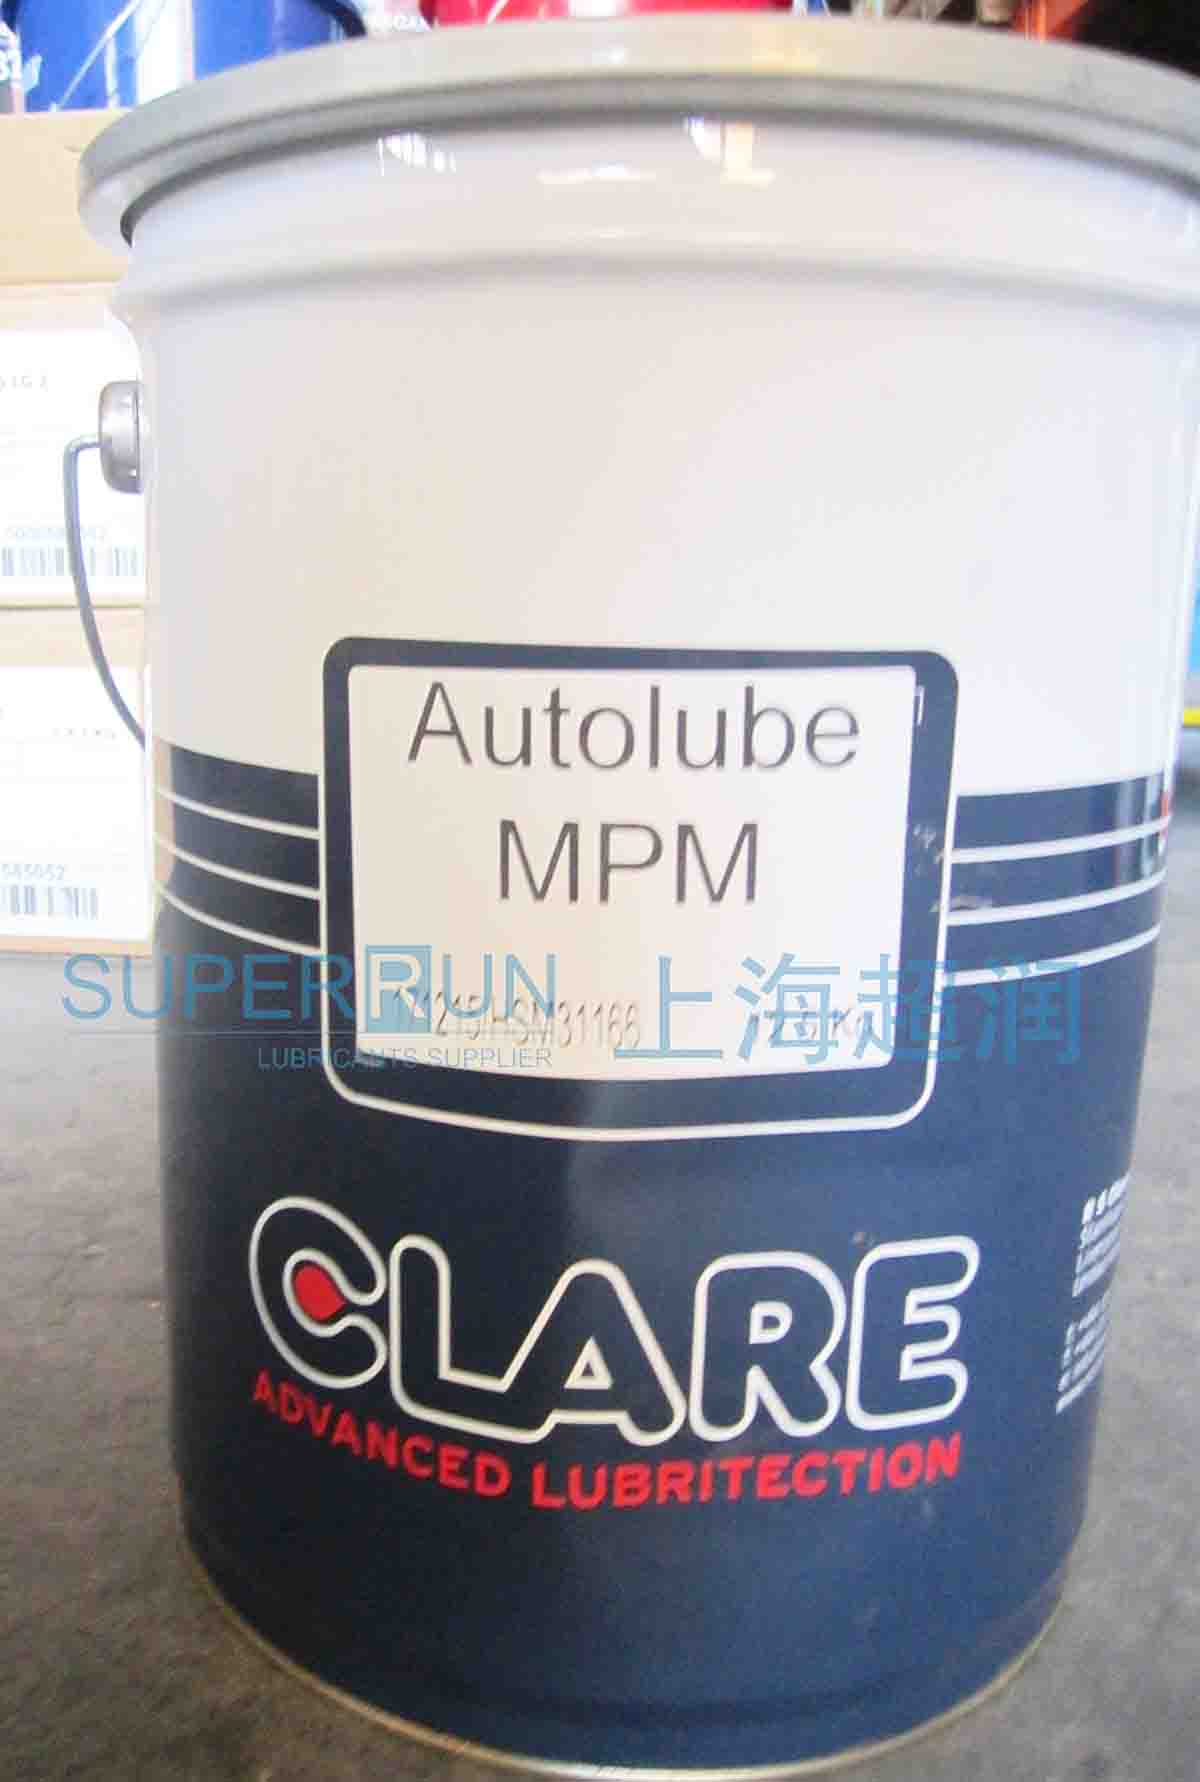 RS CLARE Autolube MPM 润滑脂